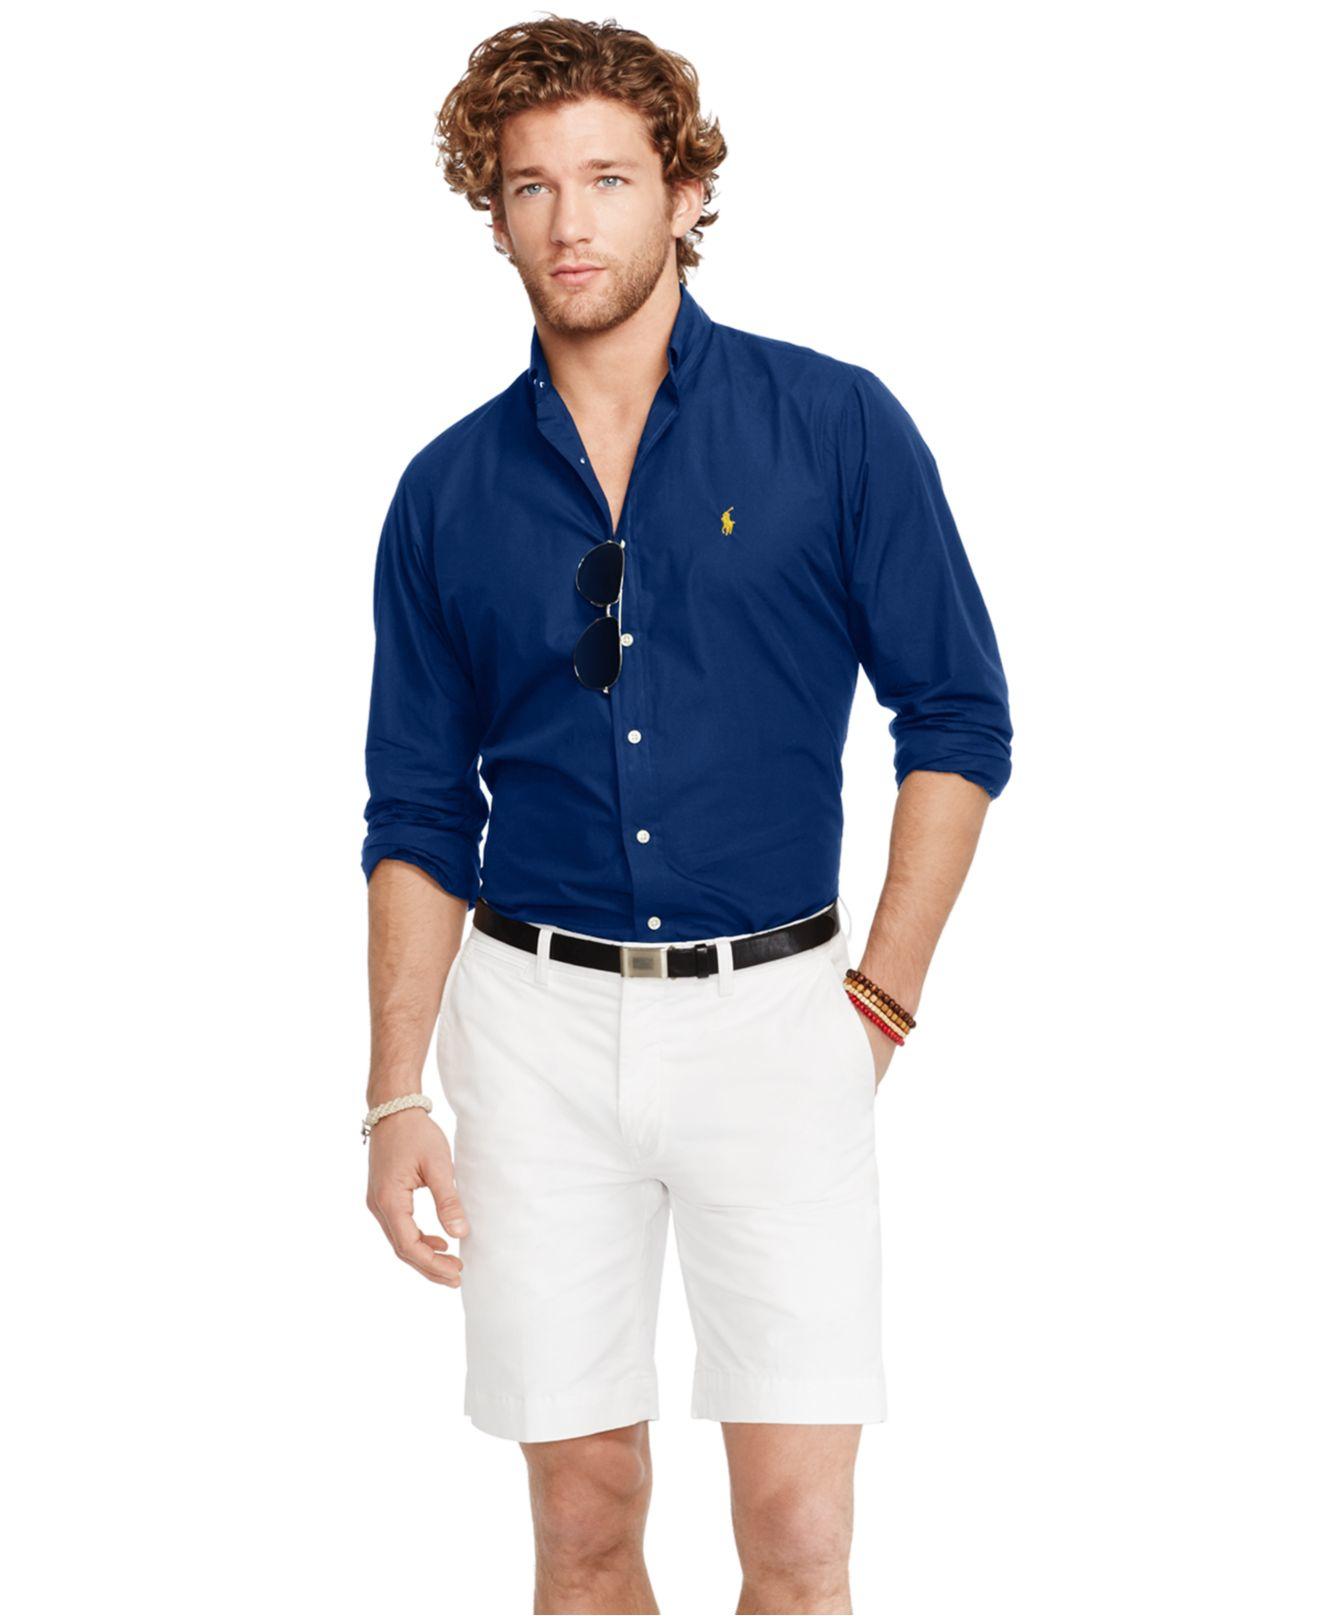 75b25585 Ralph Lauren Navy Blue Slim Fit Poplin Shirt - Nils Stucki ...